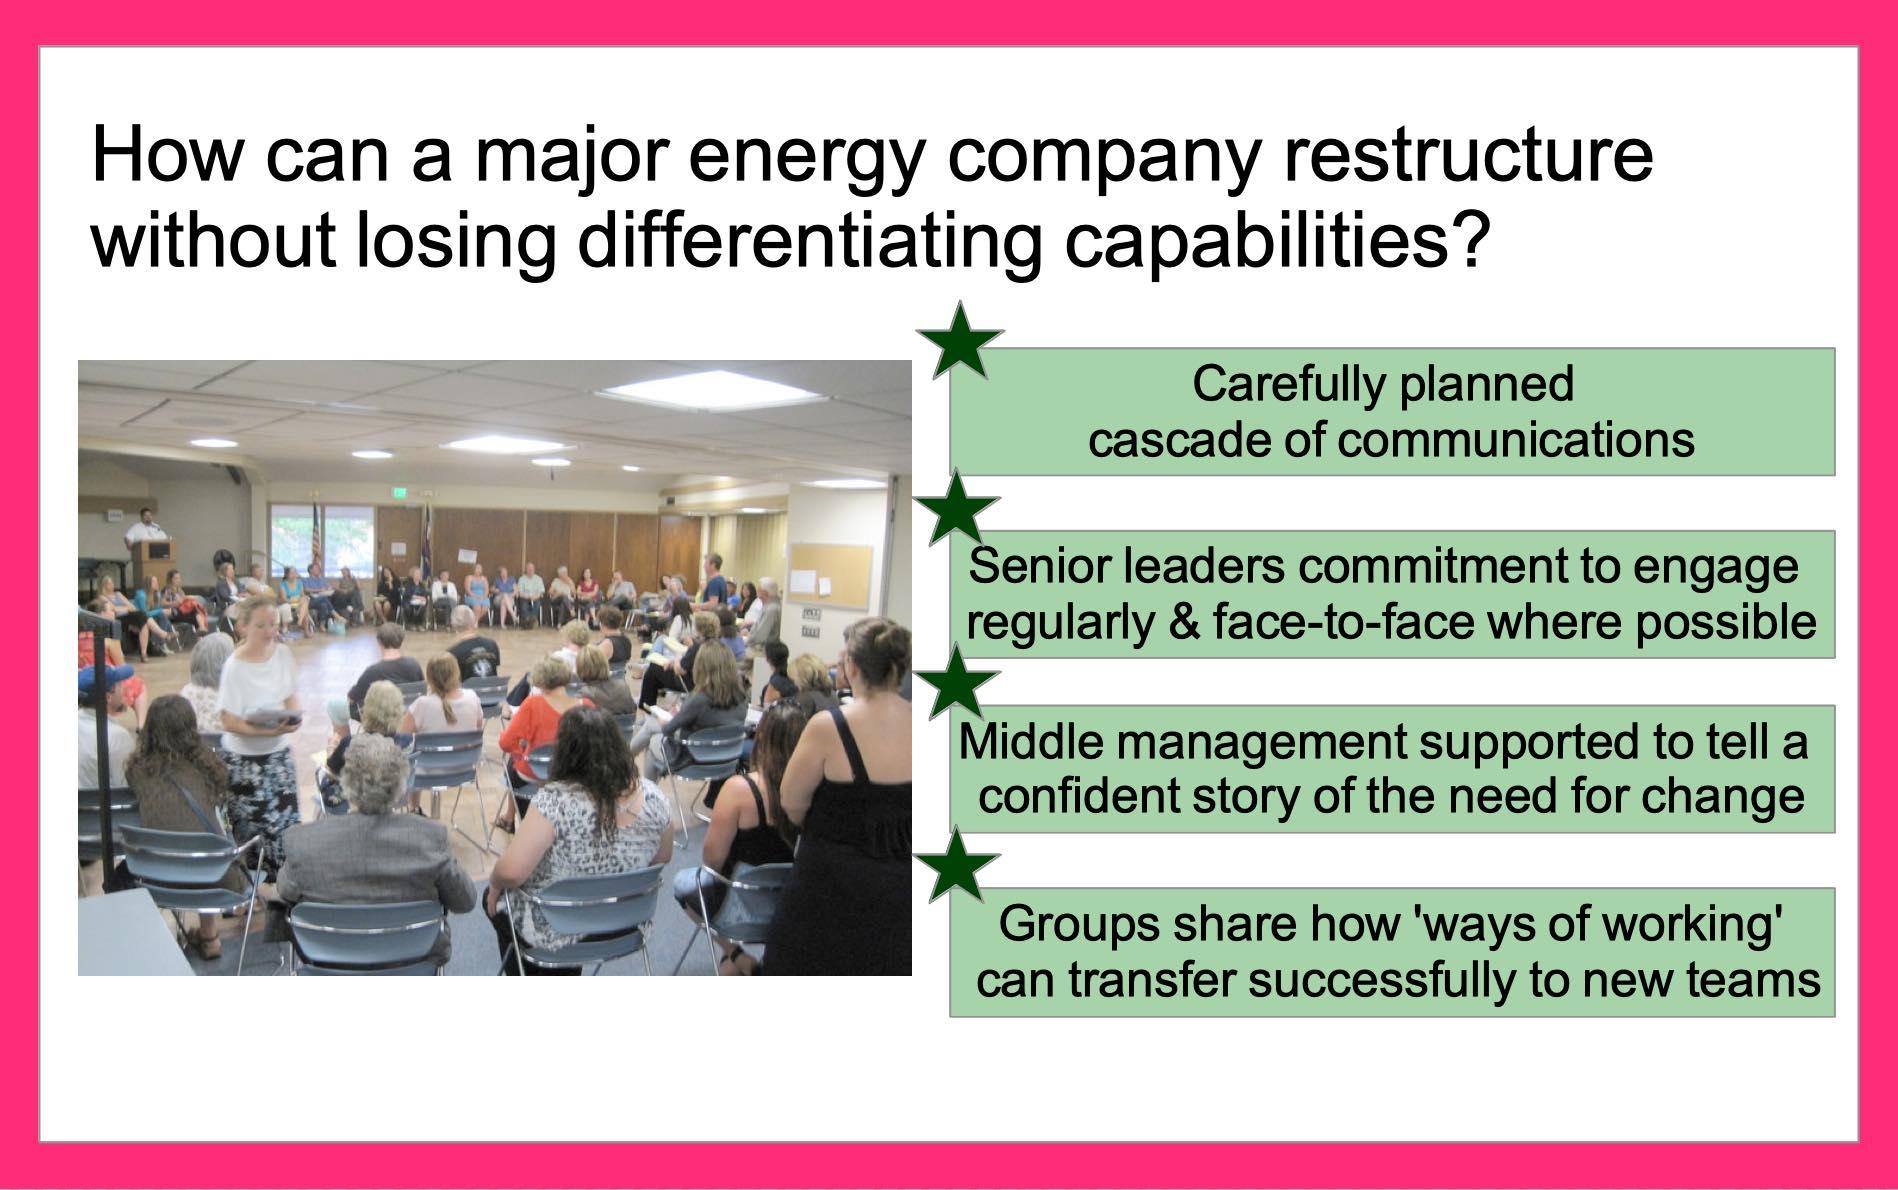 3 Retaining capabilities